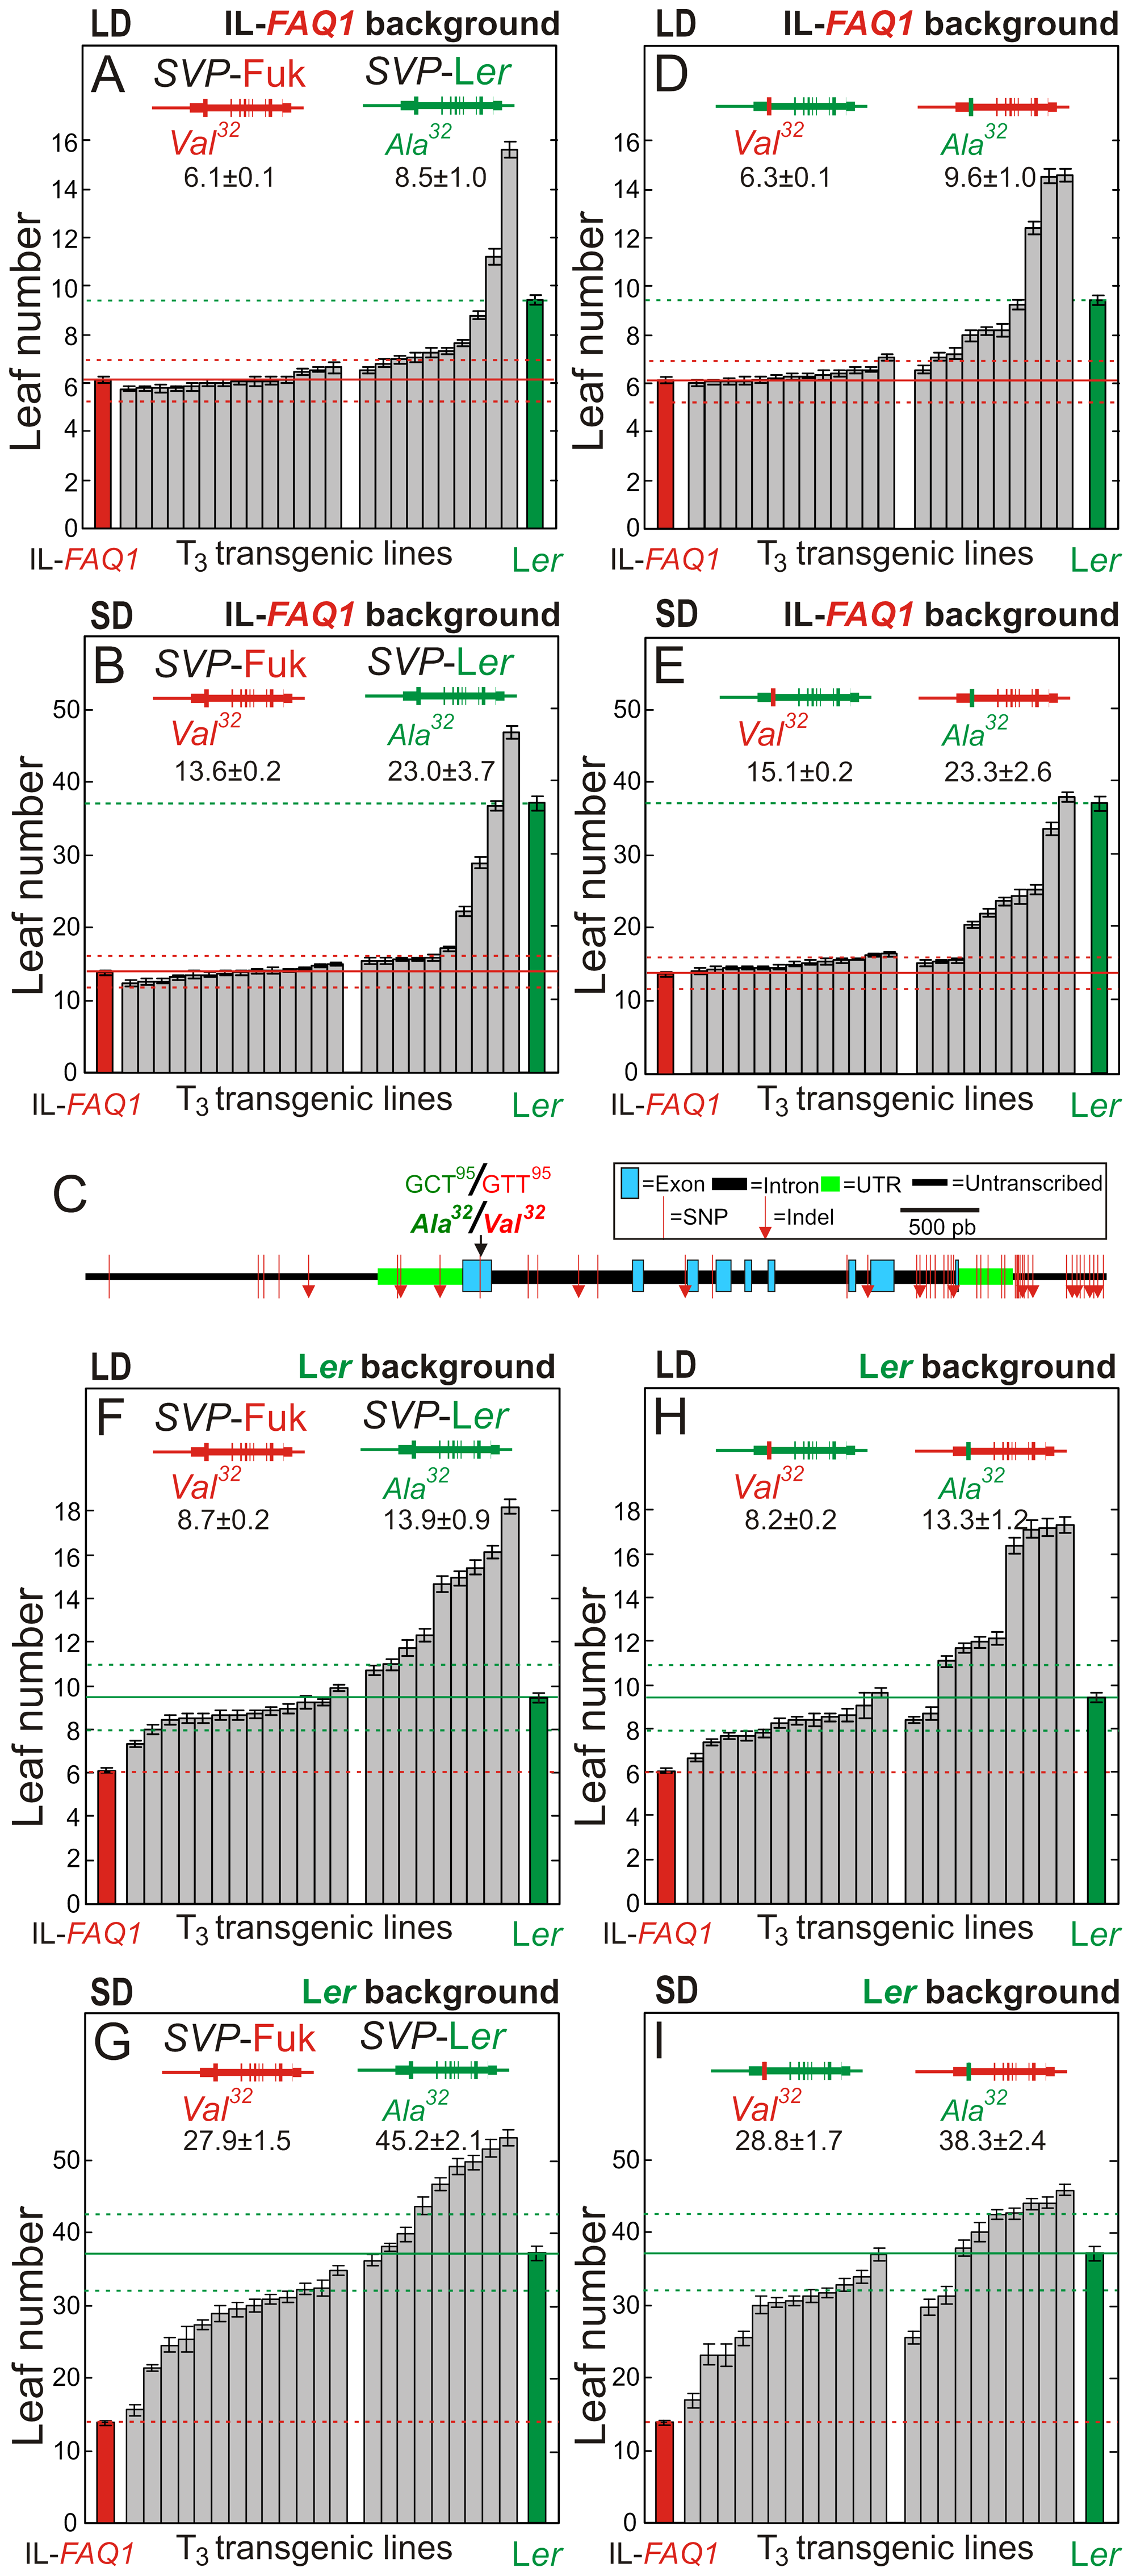 Flowering phenotypes of transgenic lines for parental and chimerical <i>SVP</i> alleles.